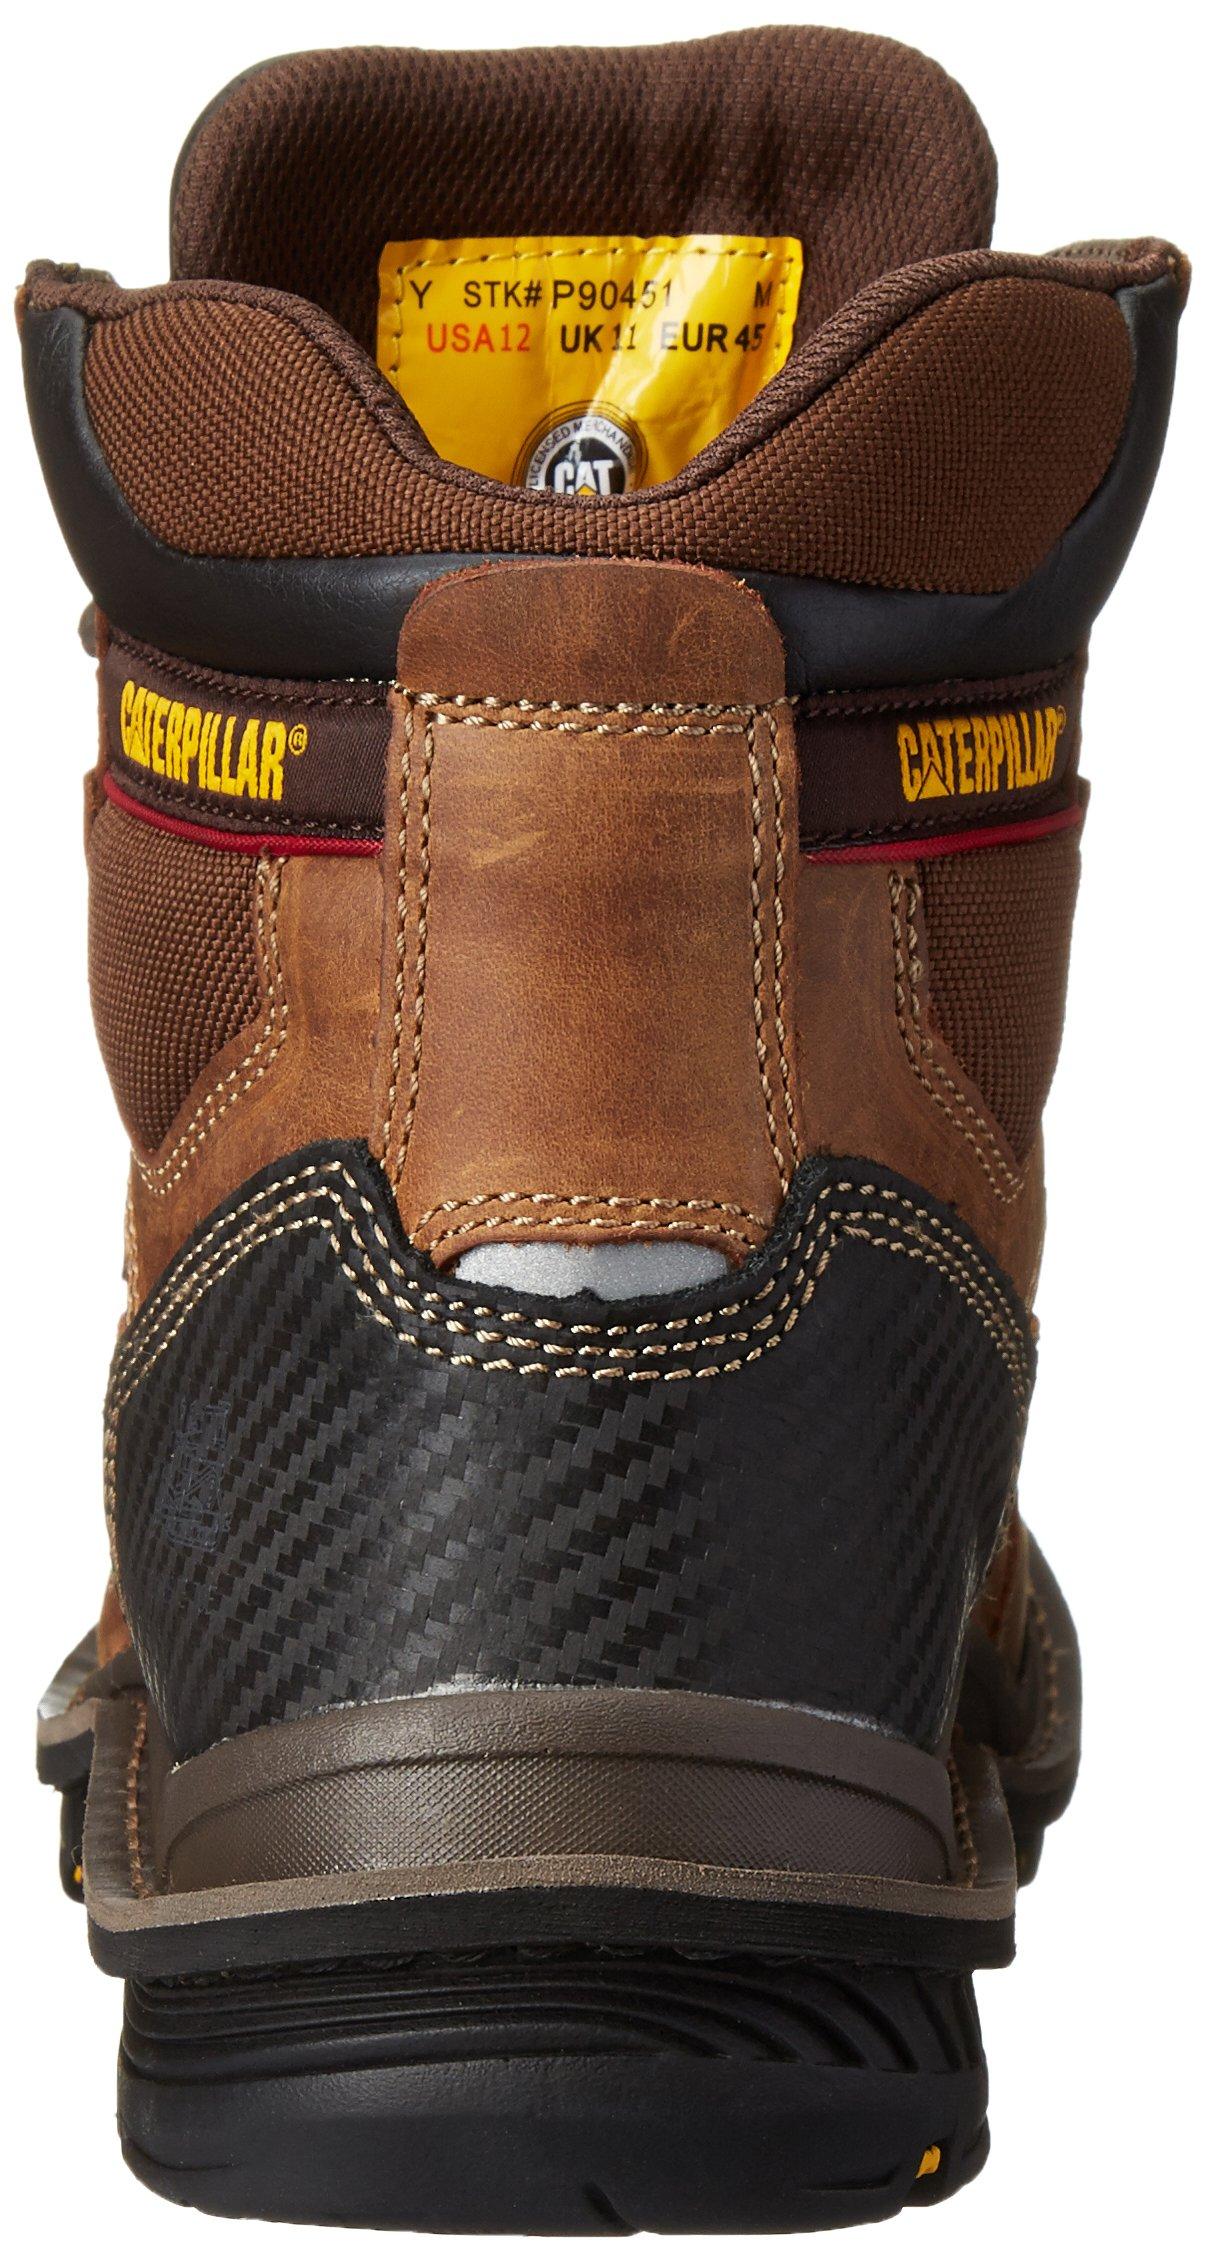 Caterpillar Men's Fabricate 6 Inch Tough Waterproof Comp Toe Work Boot, Brown, 14 M US by Caterpillar (Image #2)